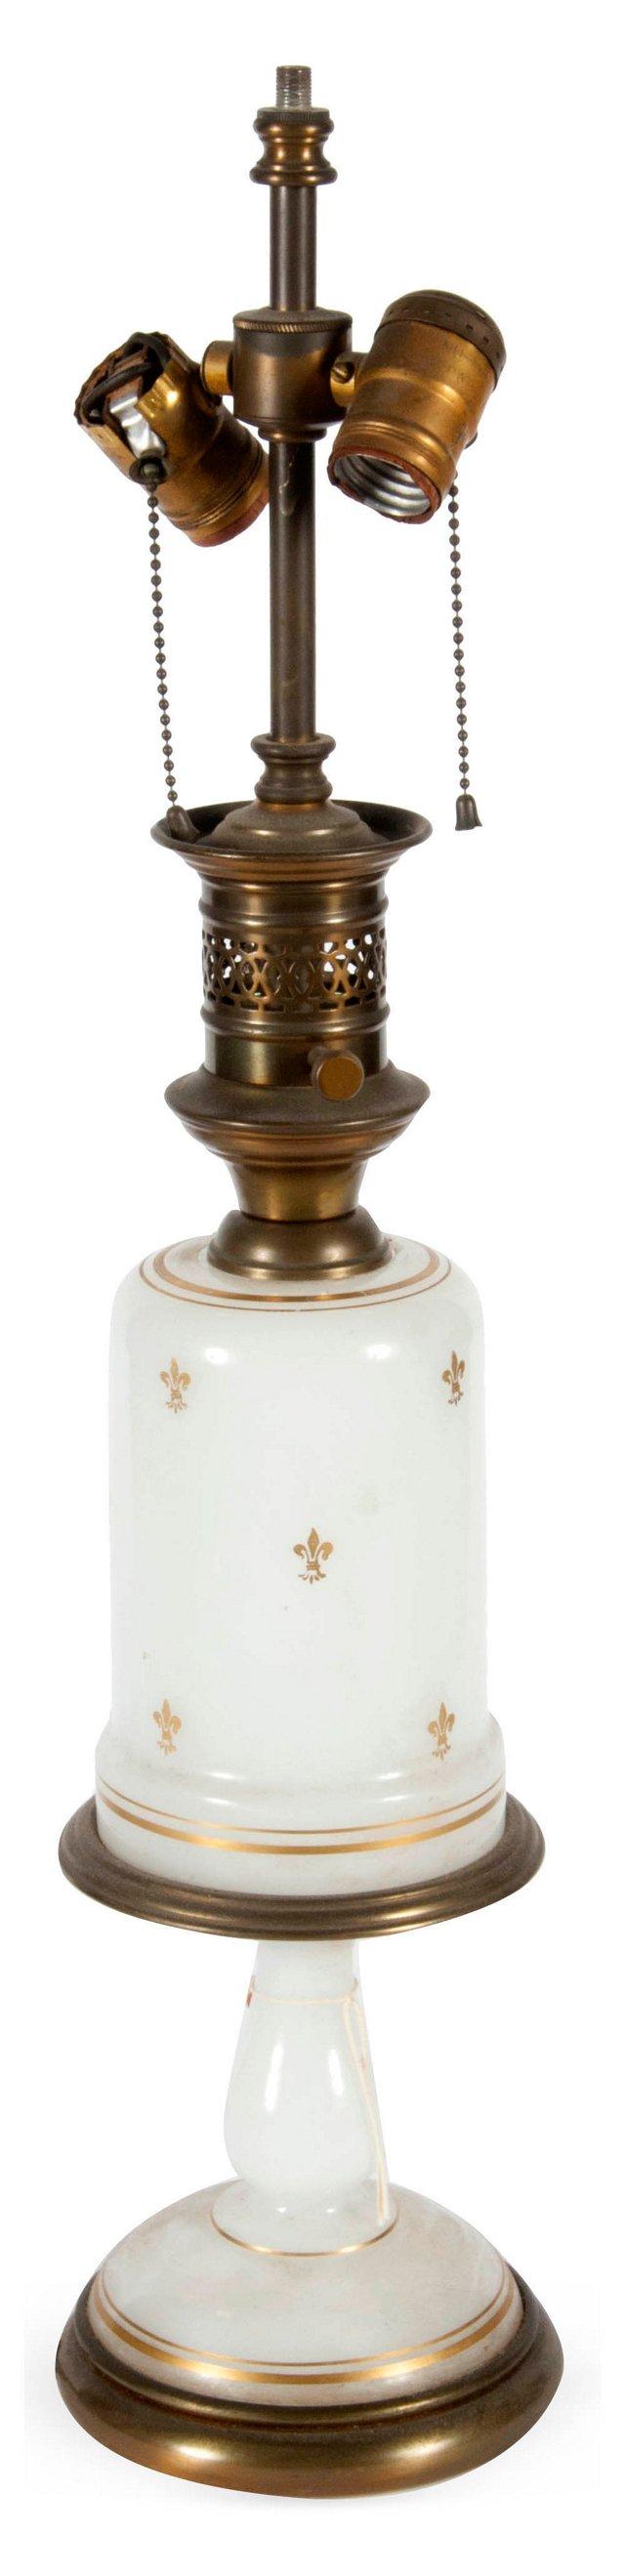 Antique Glass Lamp